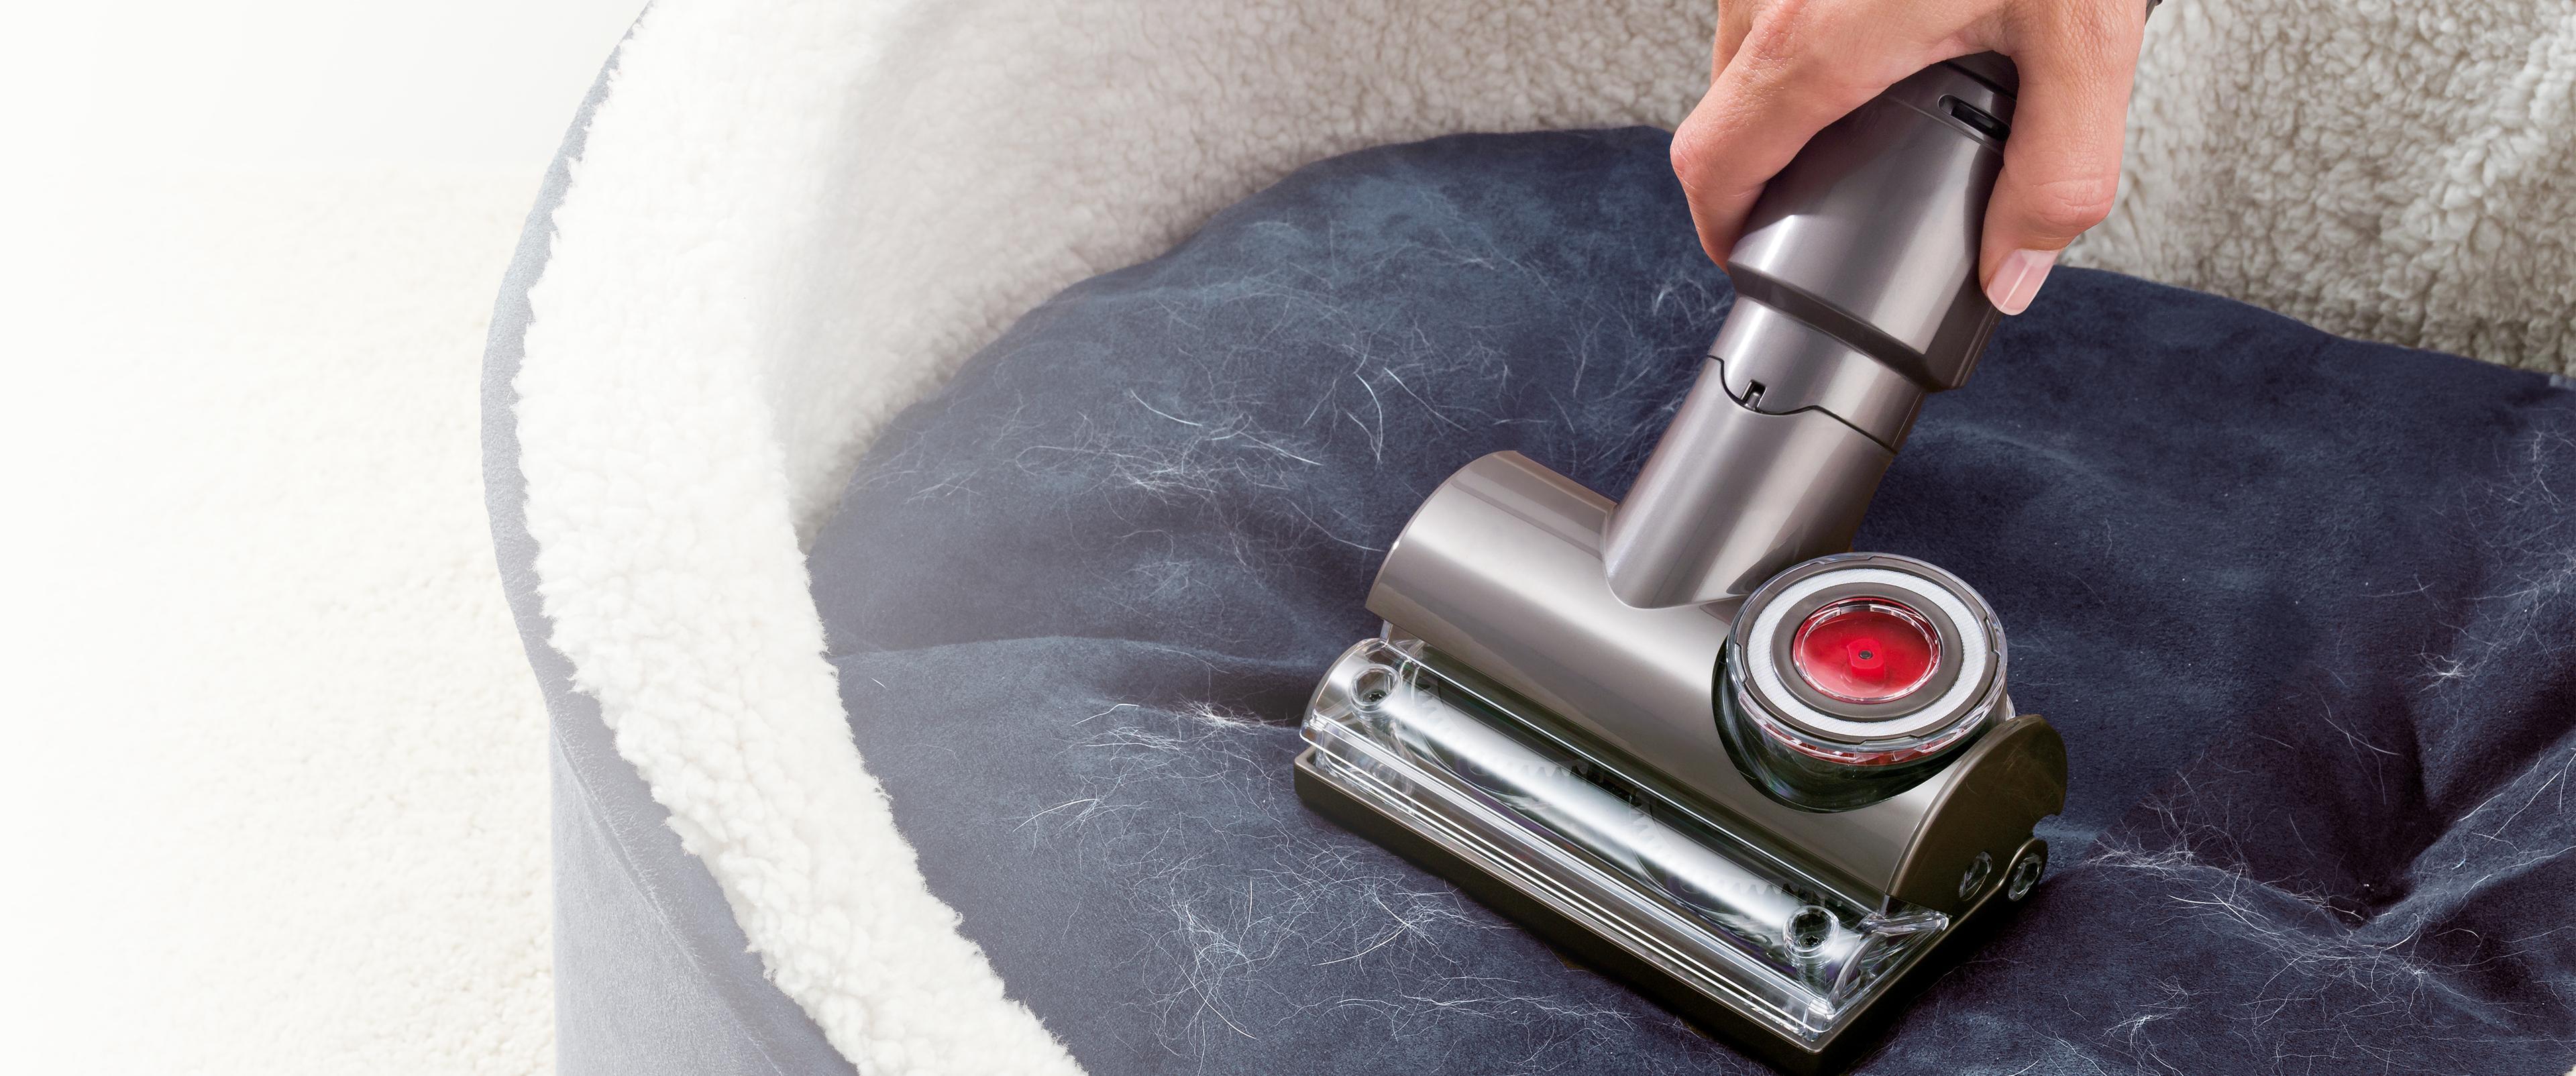 Tangle-free Turbine tool on dog bed